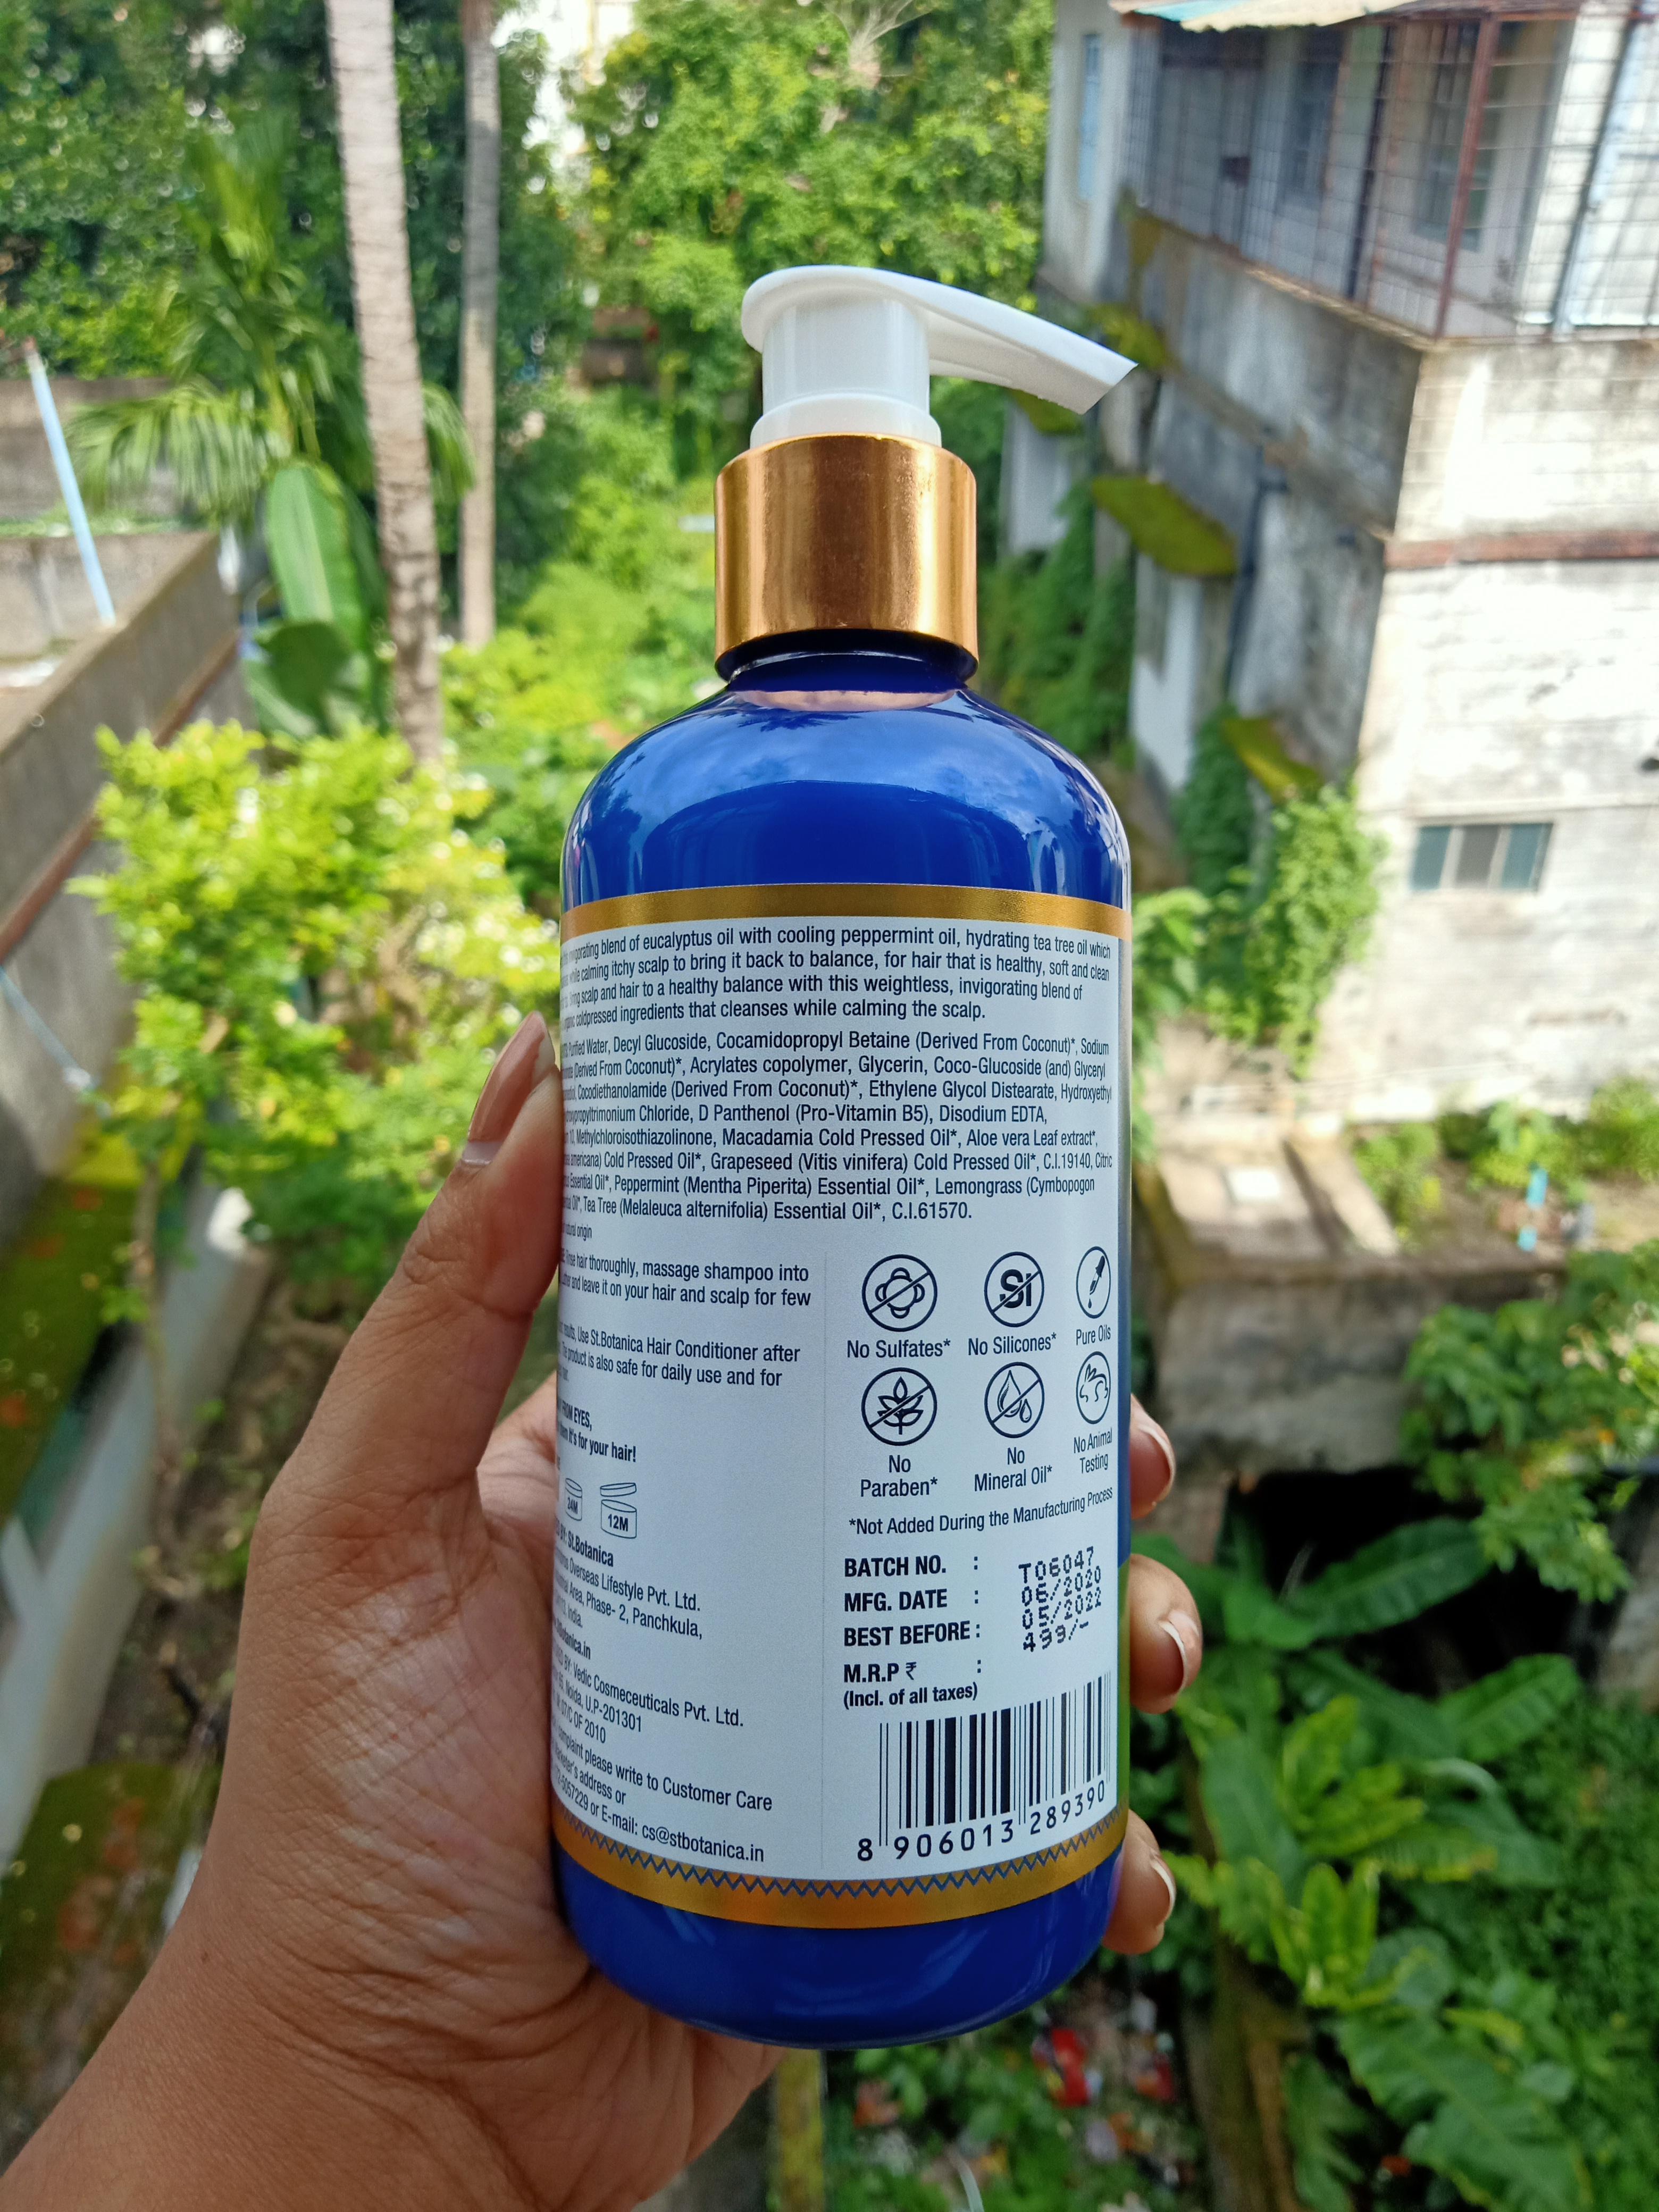 St.Botanica Eucalyptus & Tea Tree Dry Hair Repair Shampoo pic 2-Smooth No Drandruff Hair.-By rweehma